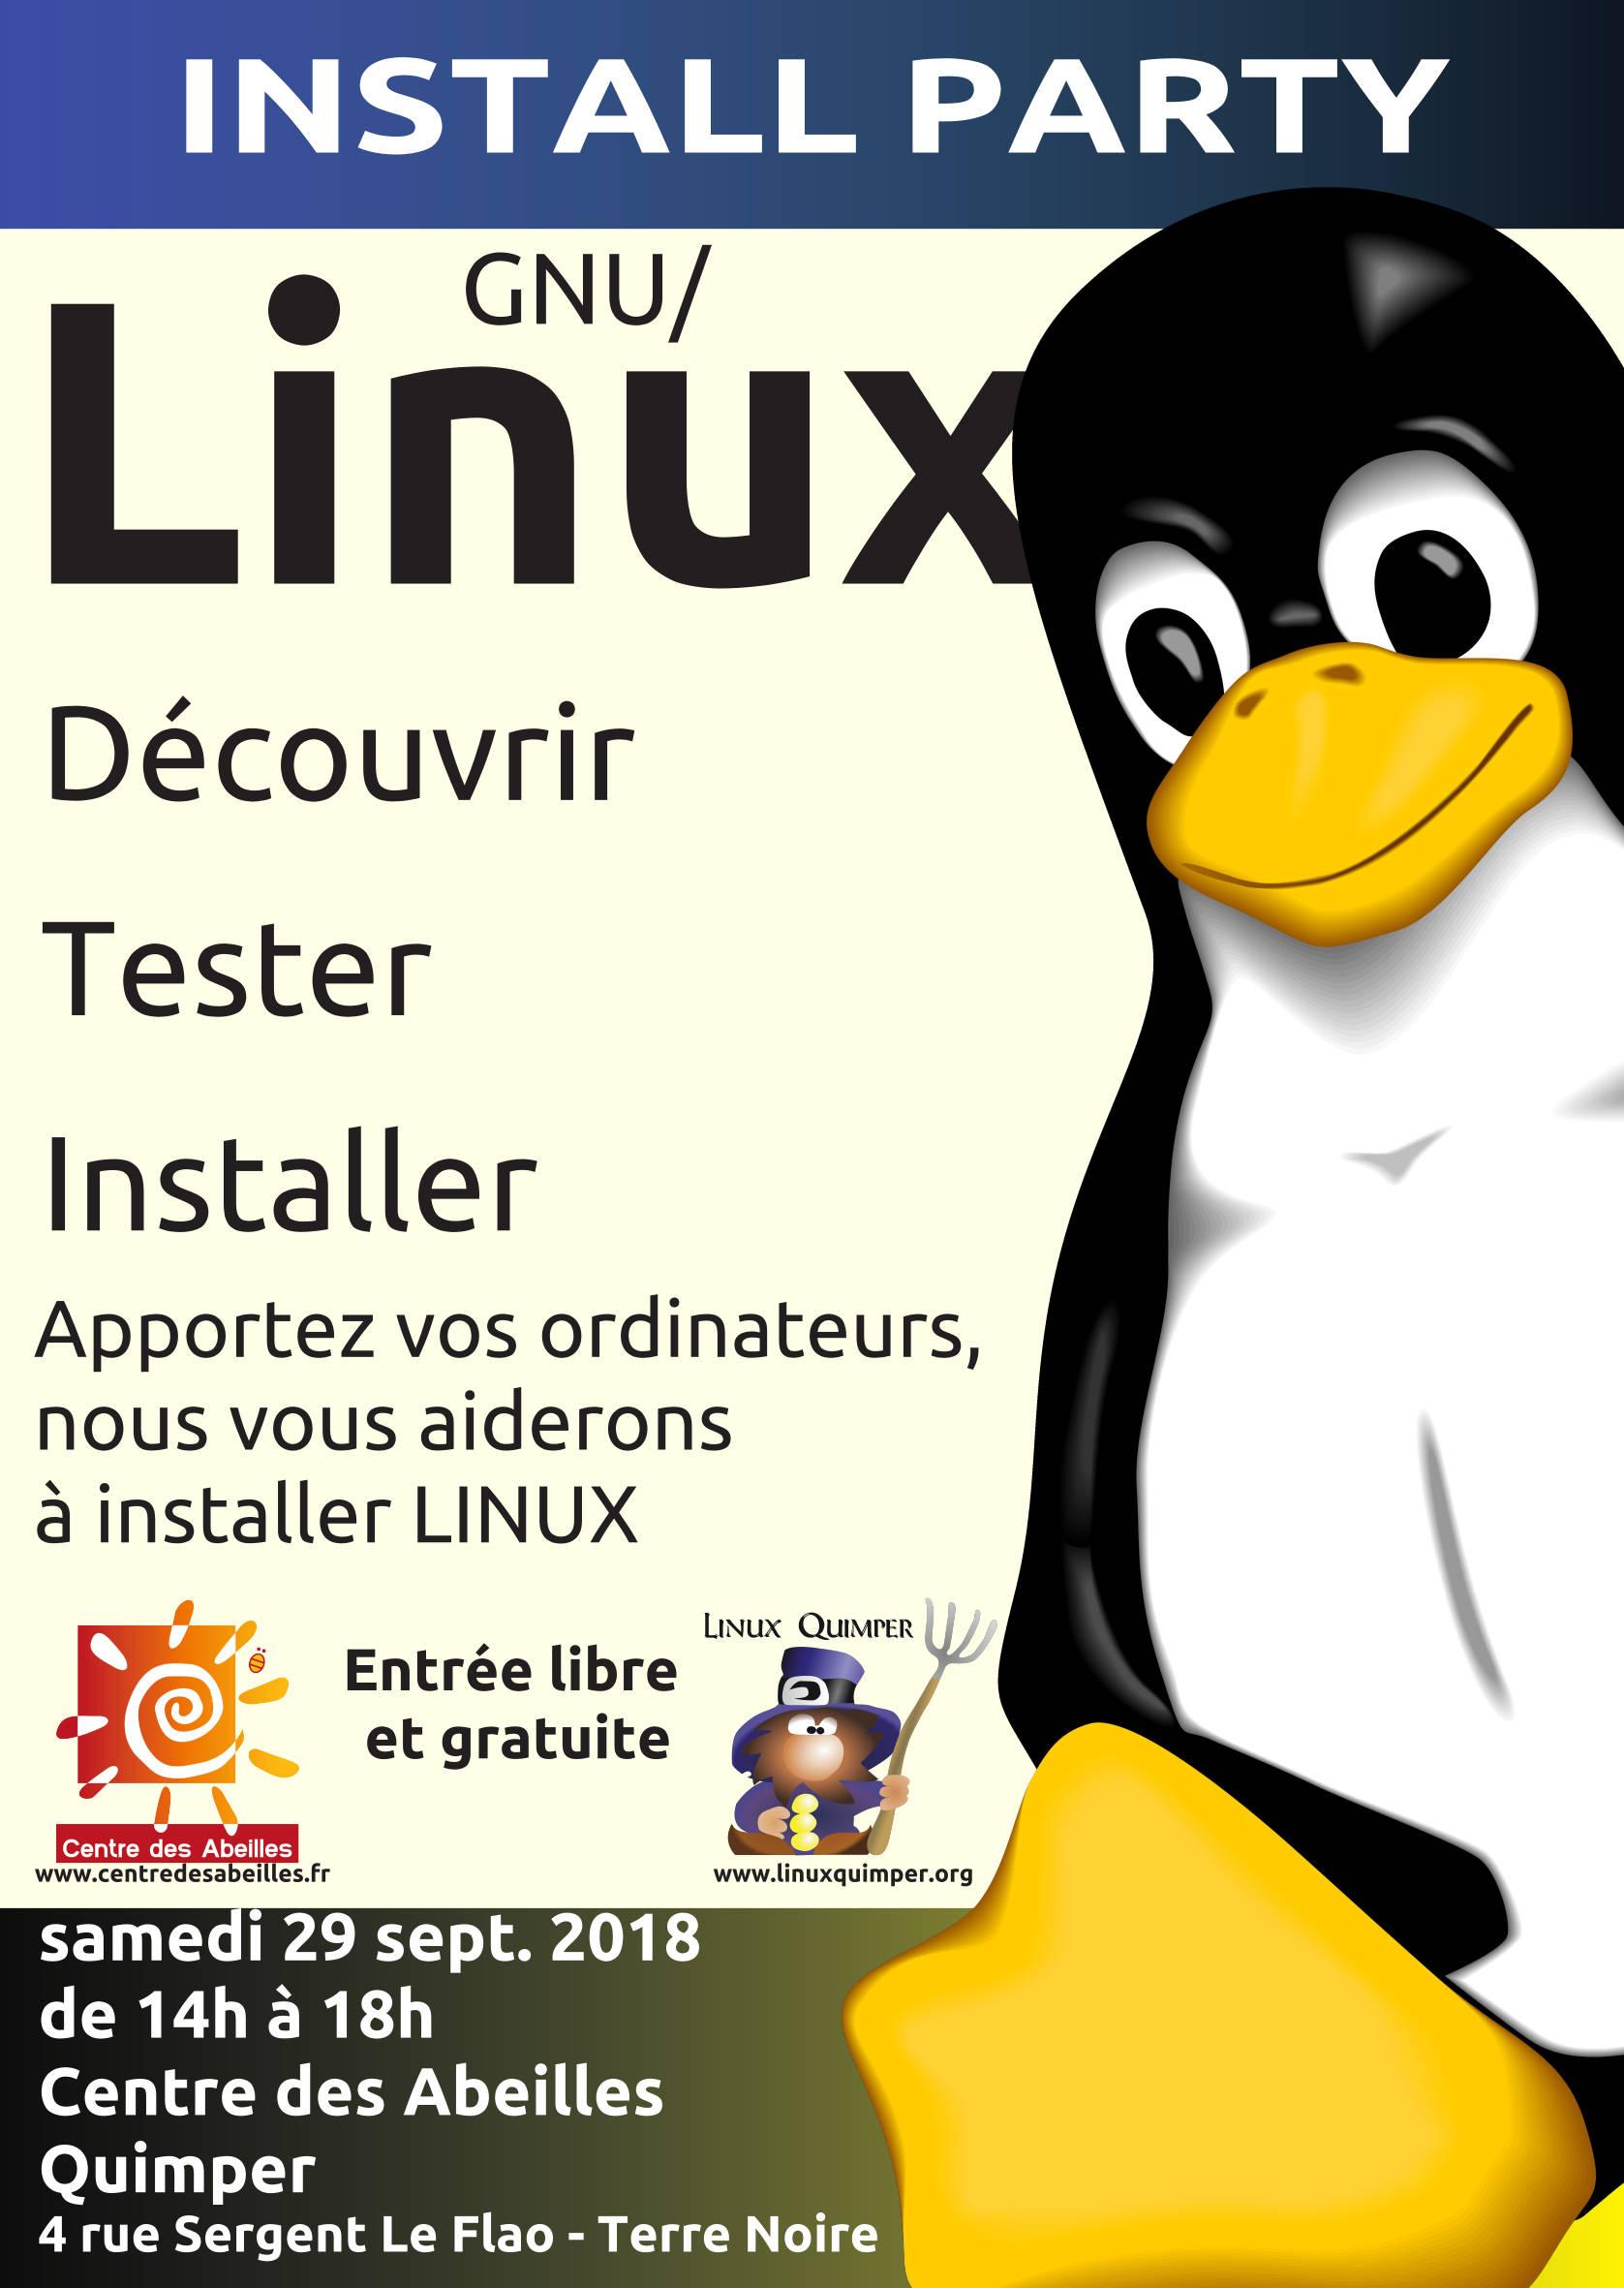 Linux Quimper